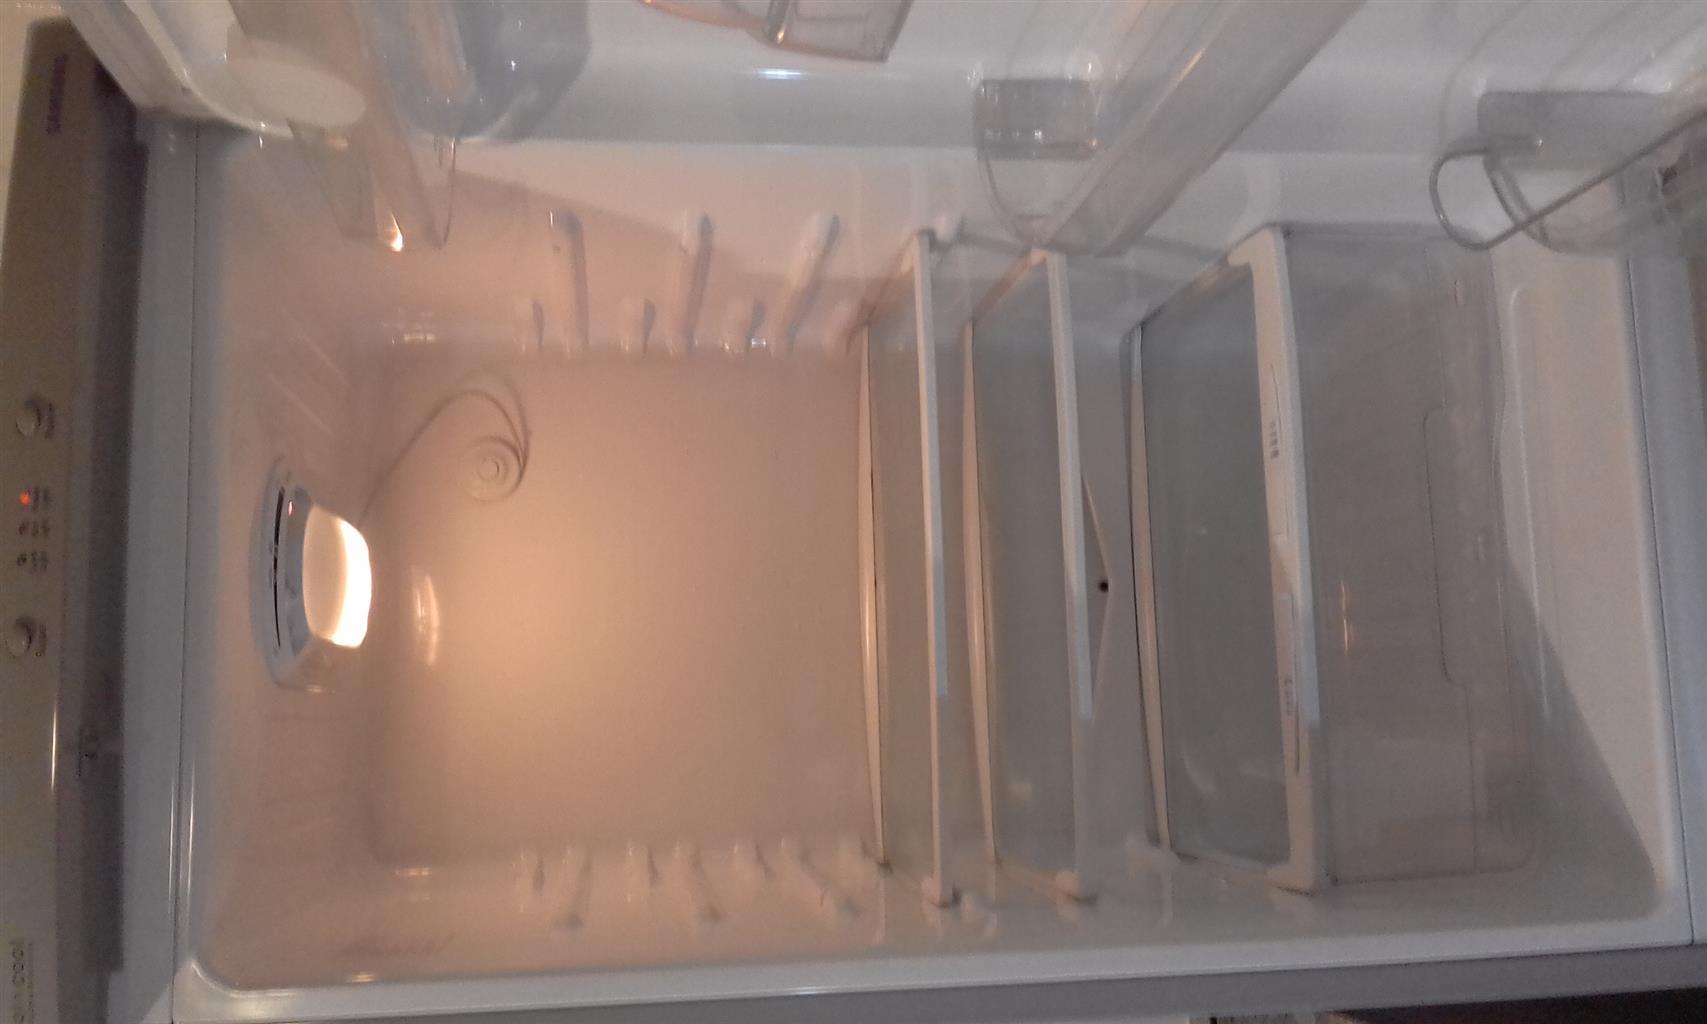 370L Samsung Cool n Cool Fridge Freezer